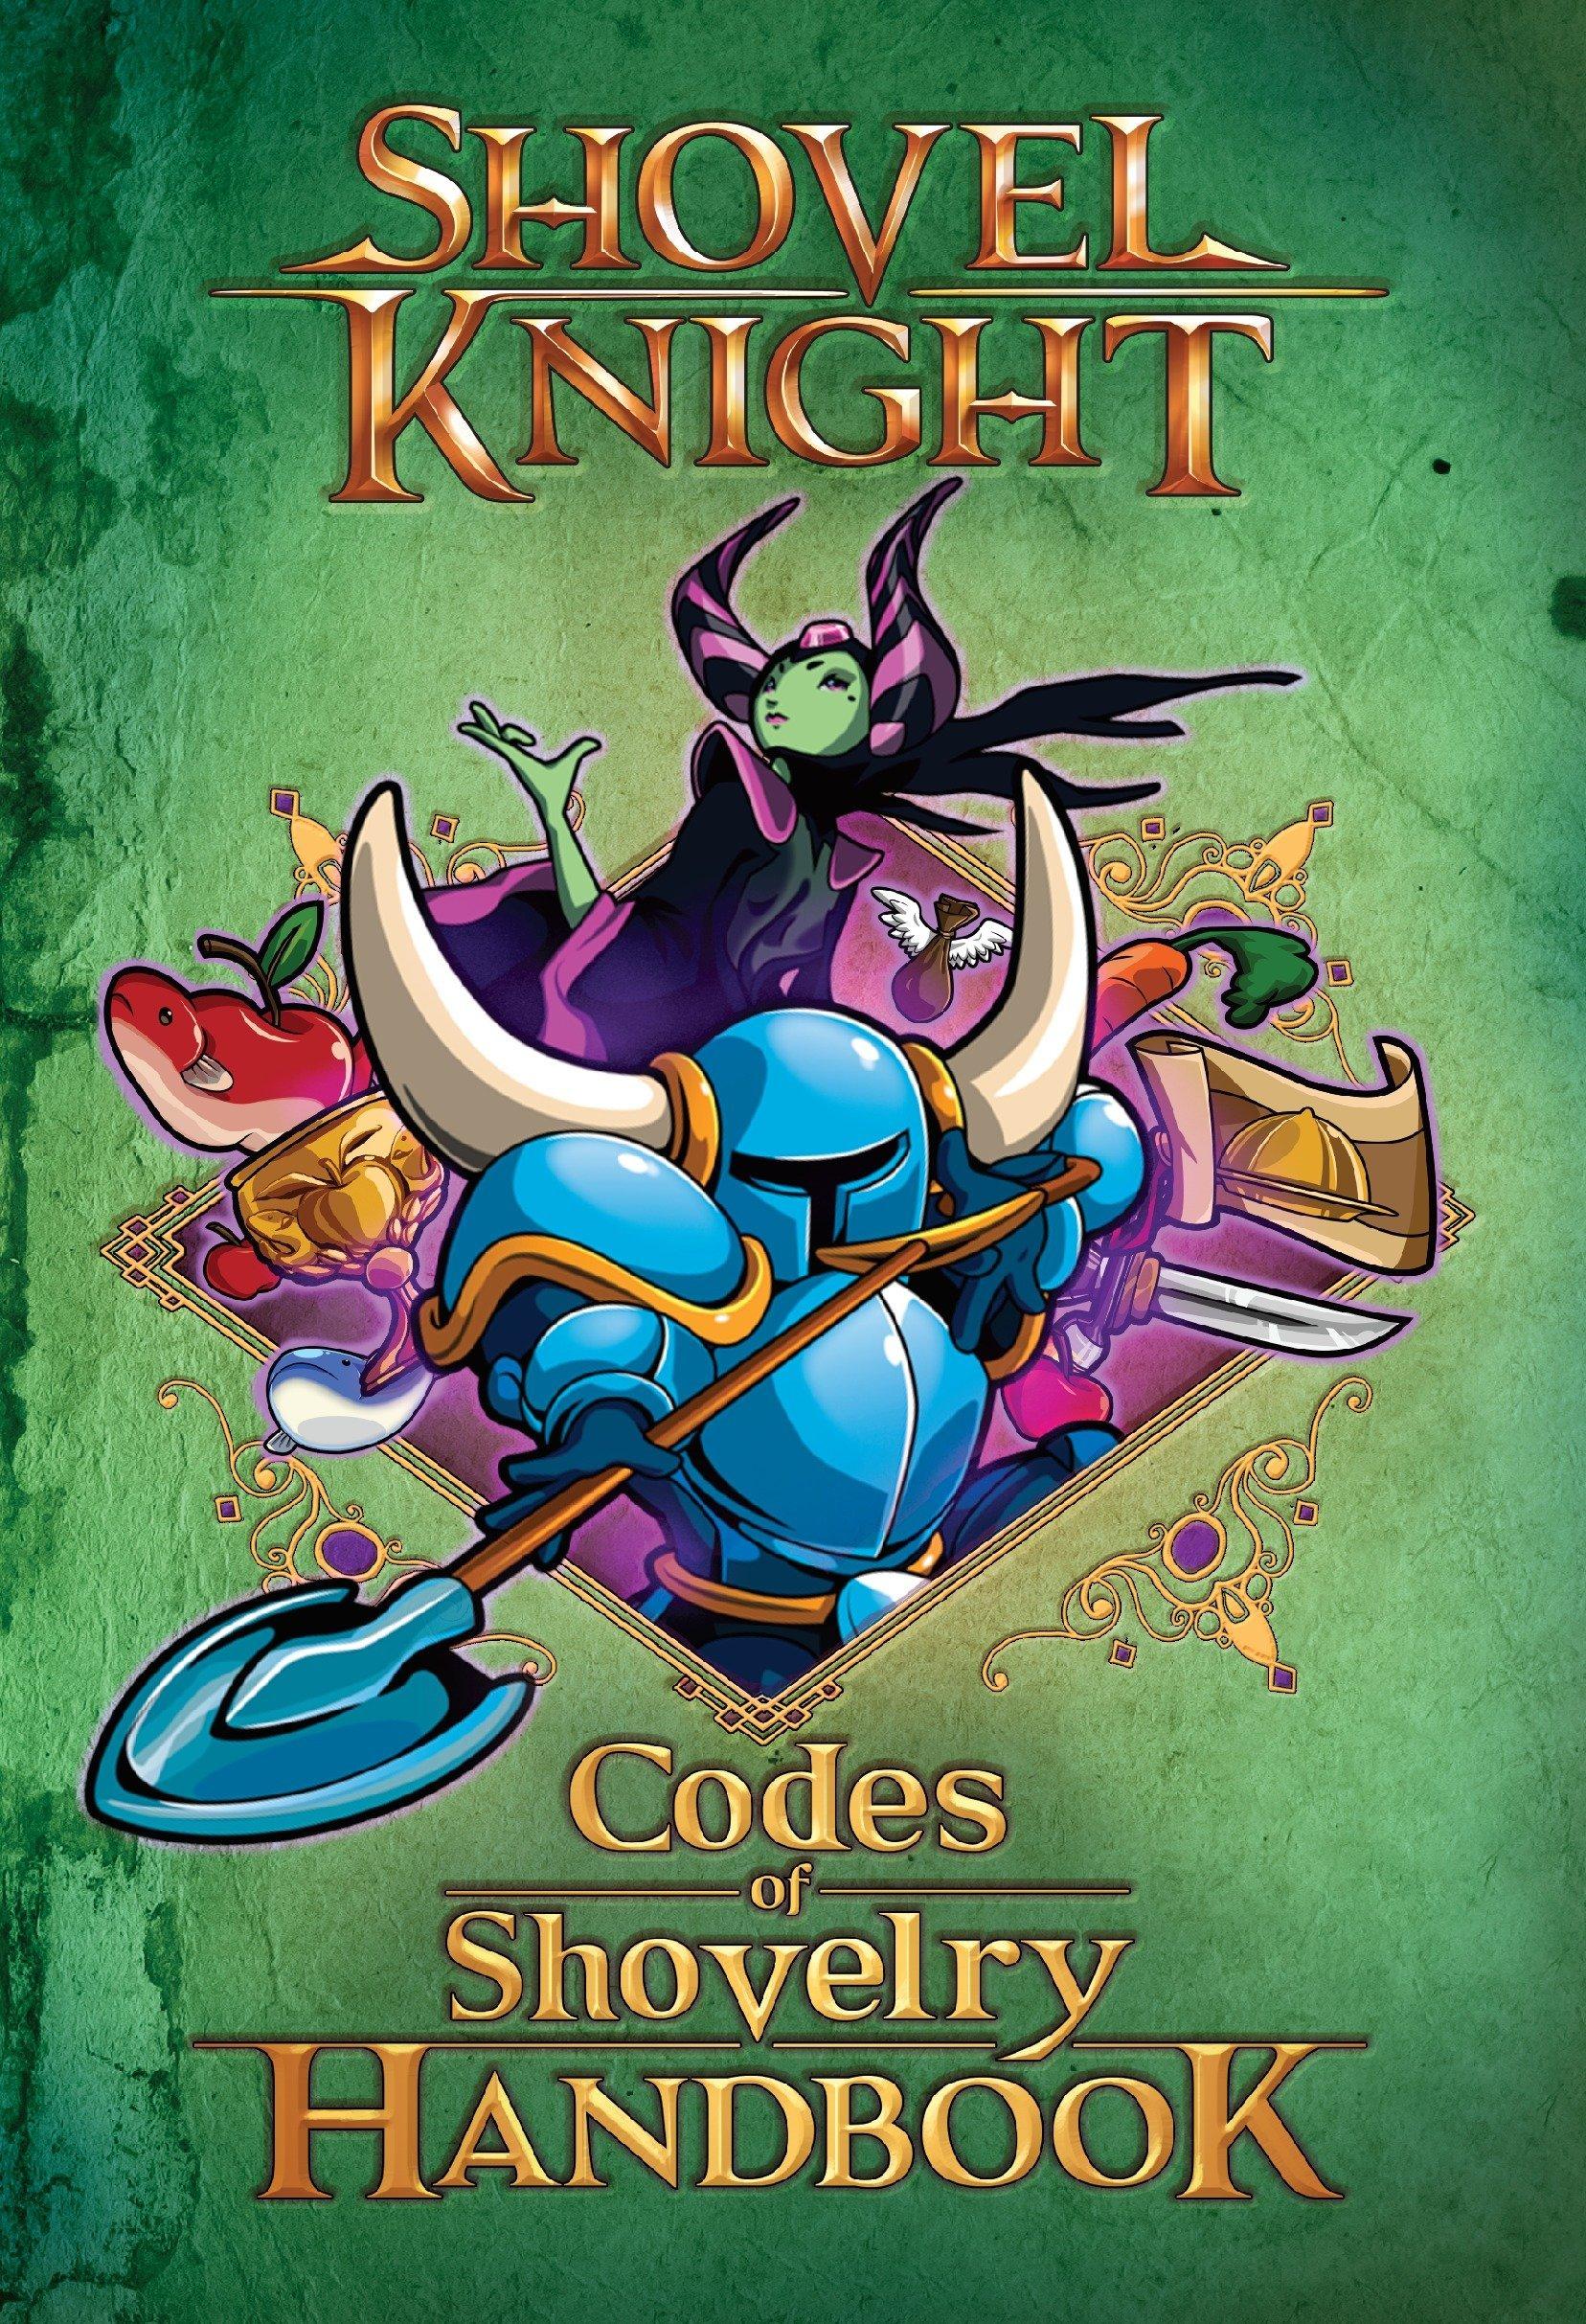 Download Codes of Shovelry Handbook (Shovel Knight) ebook